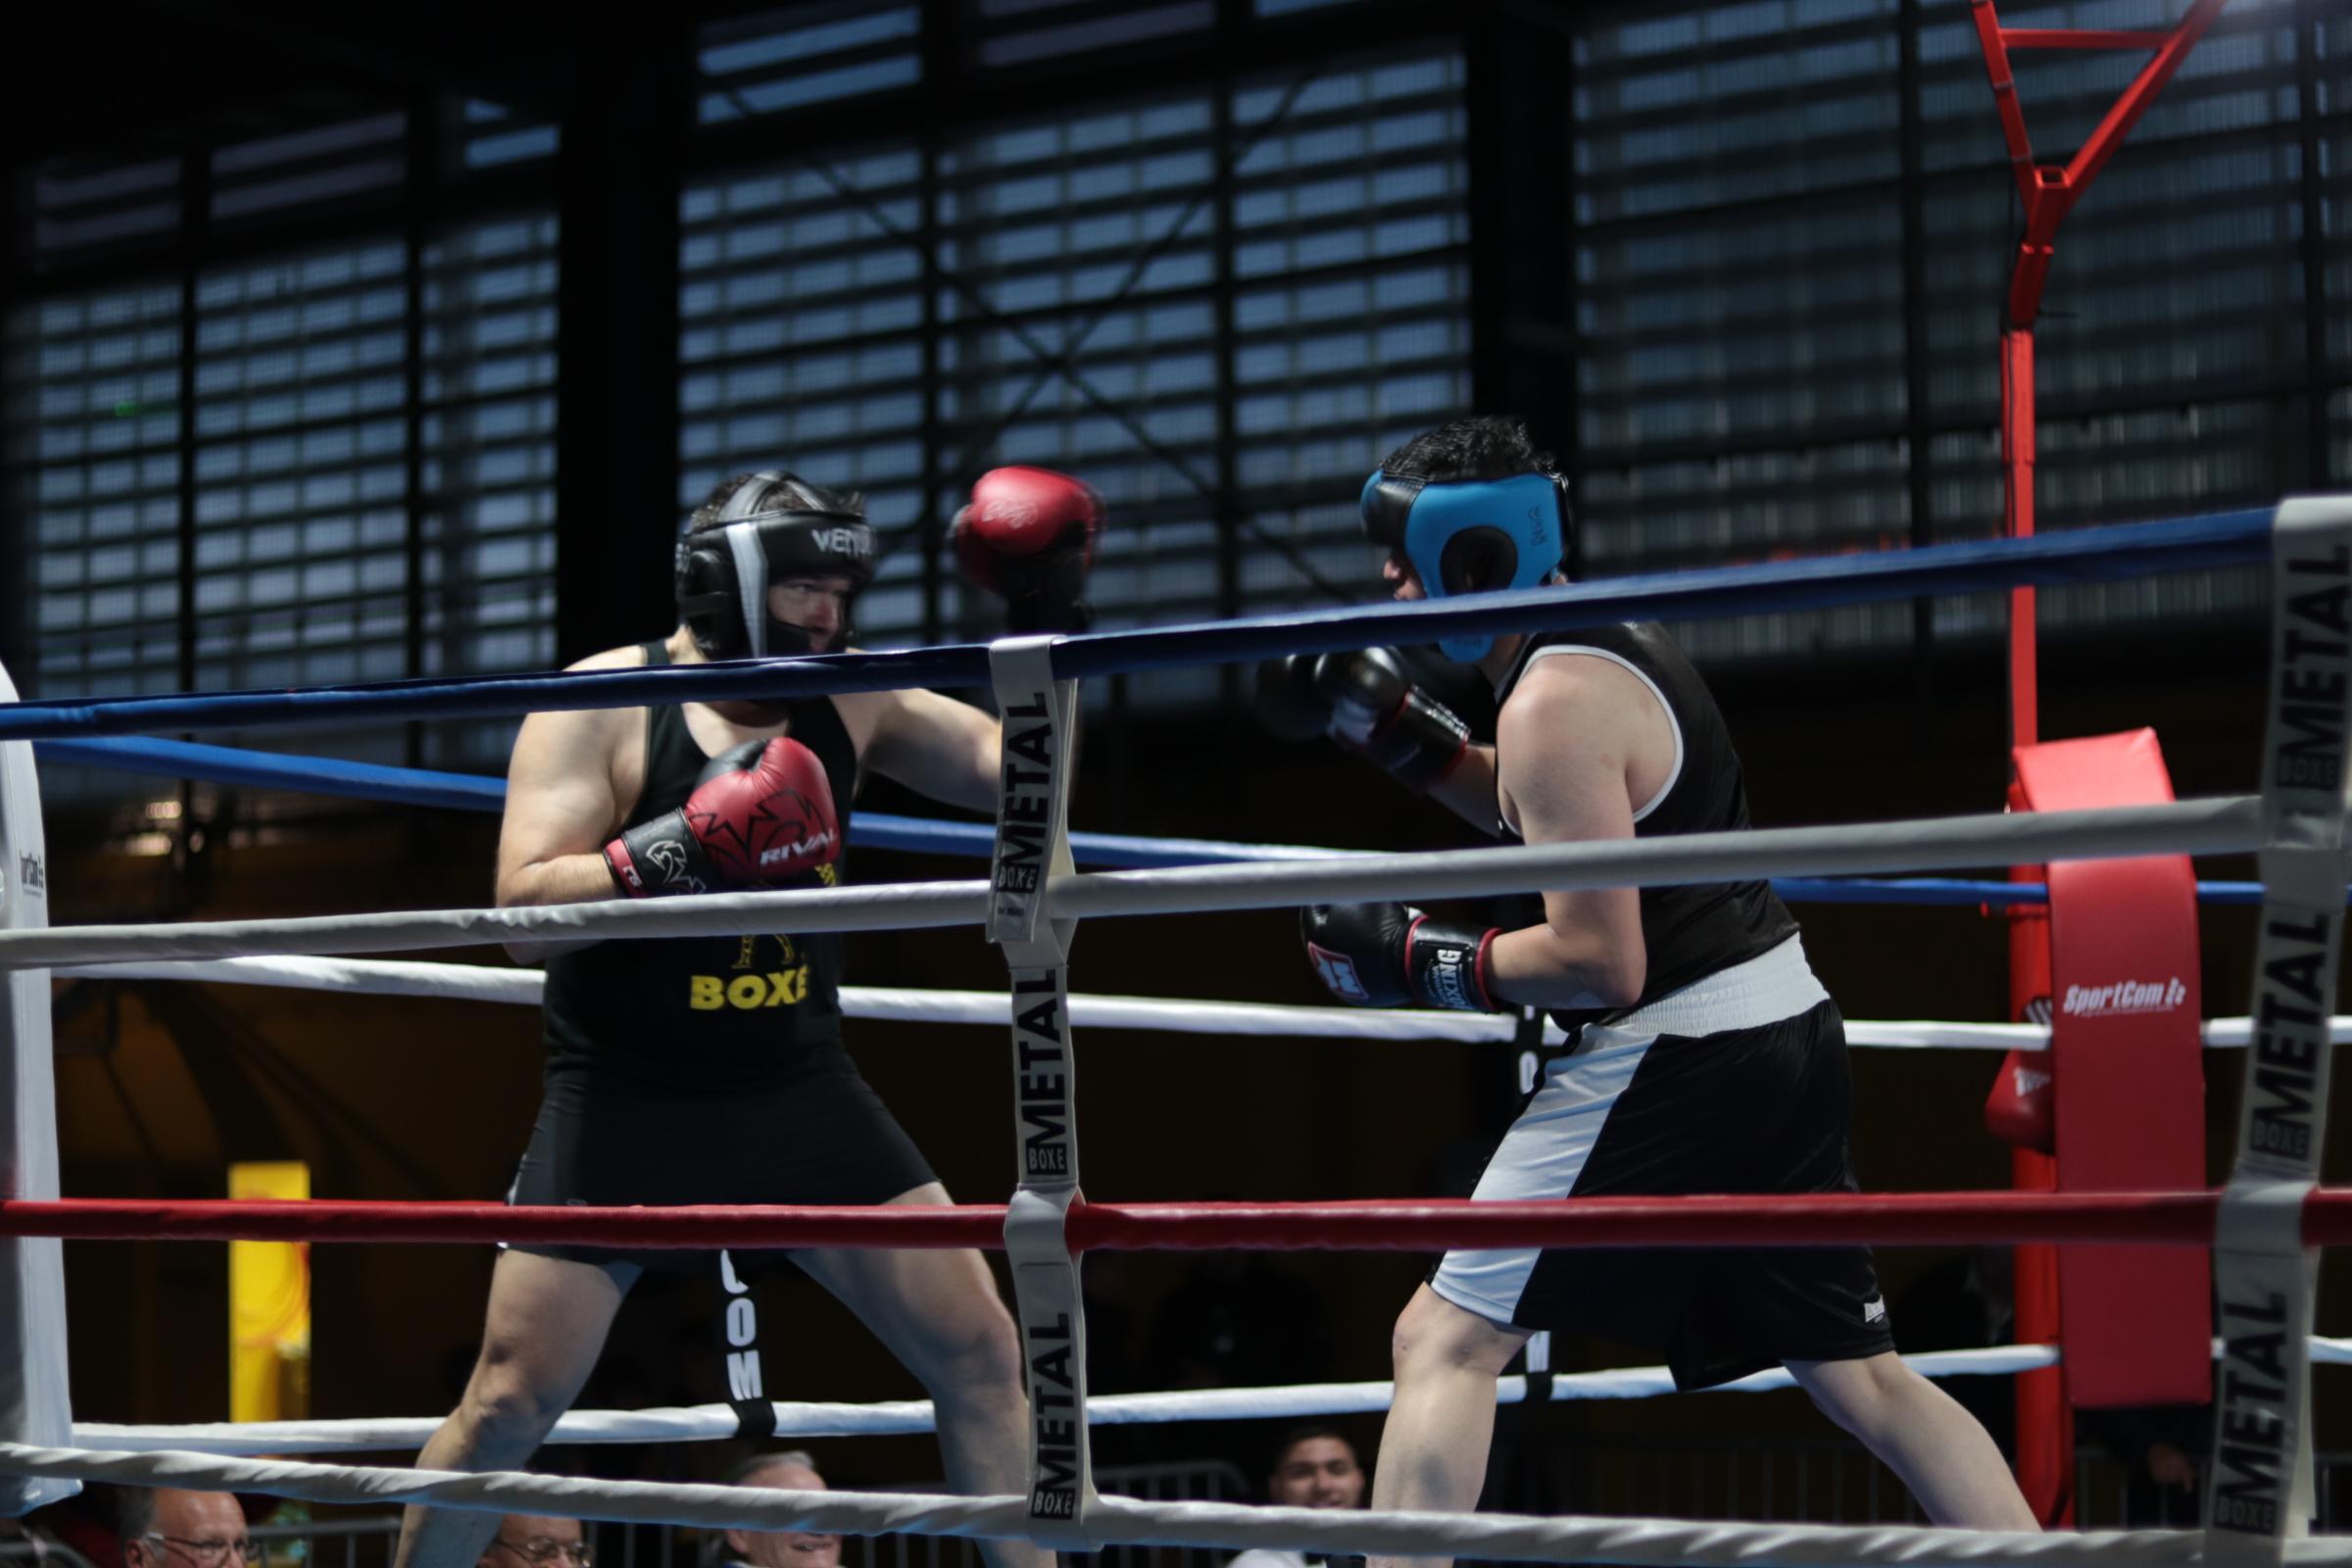 Boxeeducativeadulte Boxe Pessac